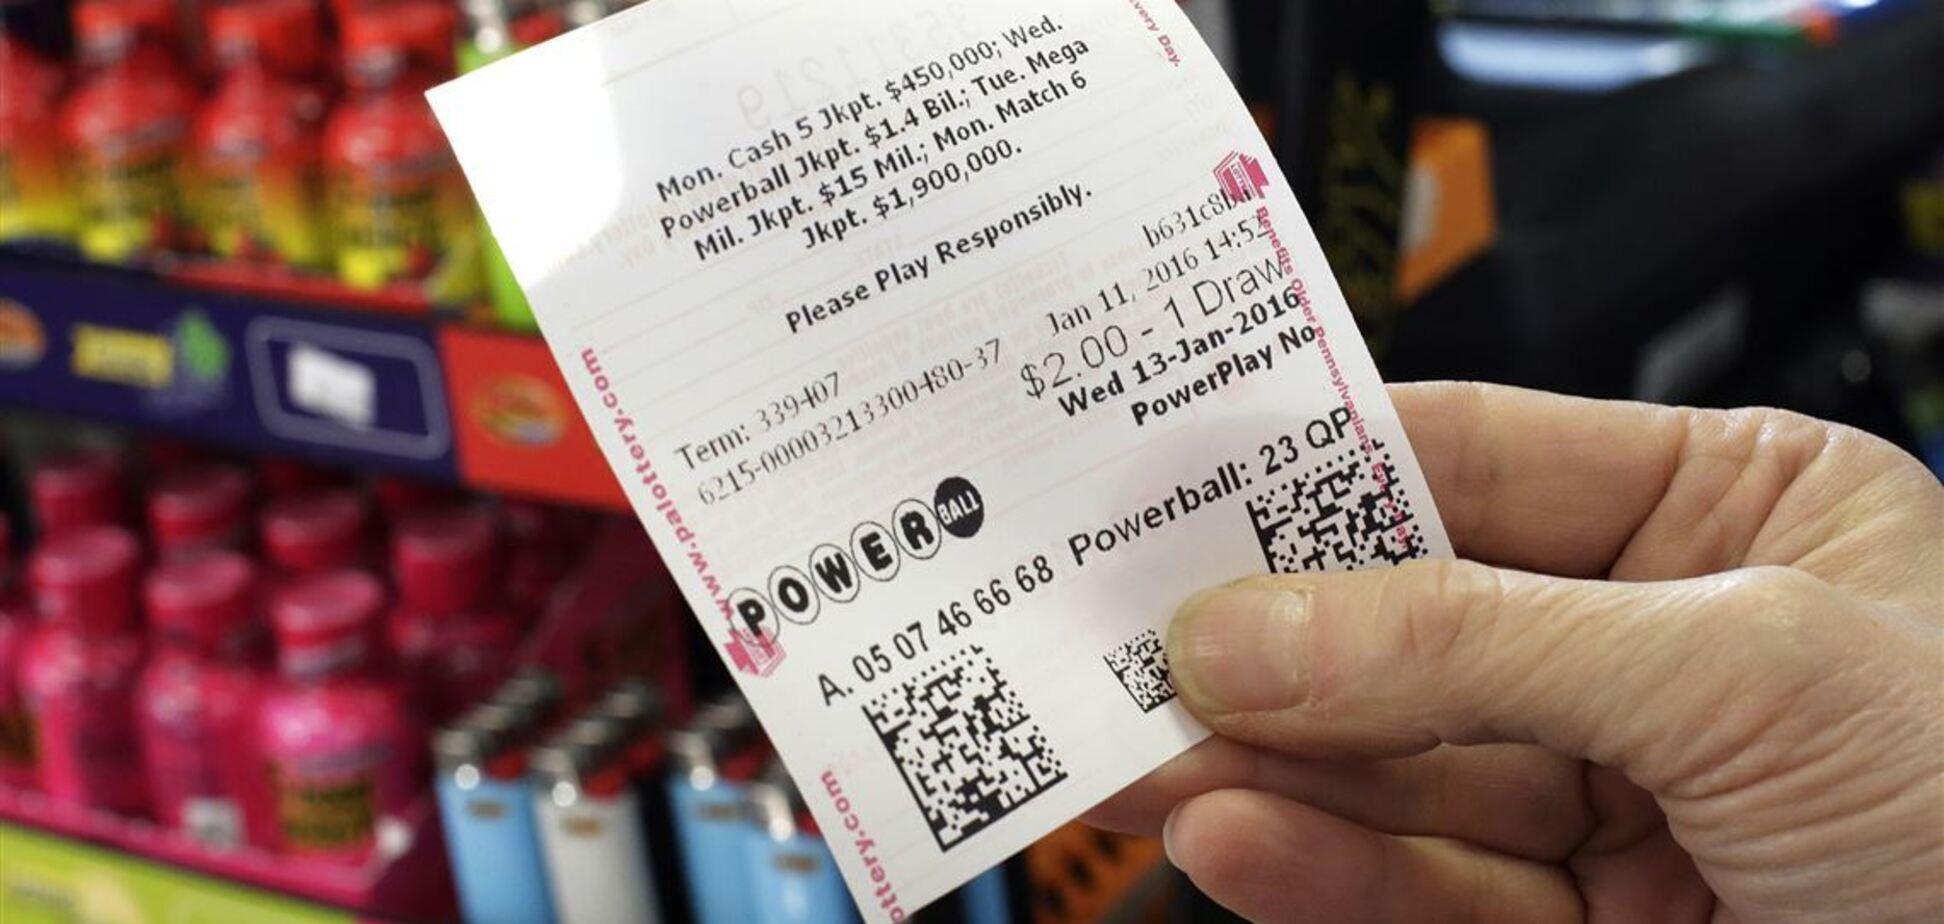 Powerball США разыграет $523 млн: как приобрести билет из Украины